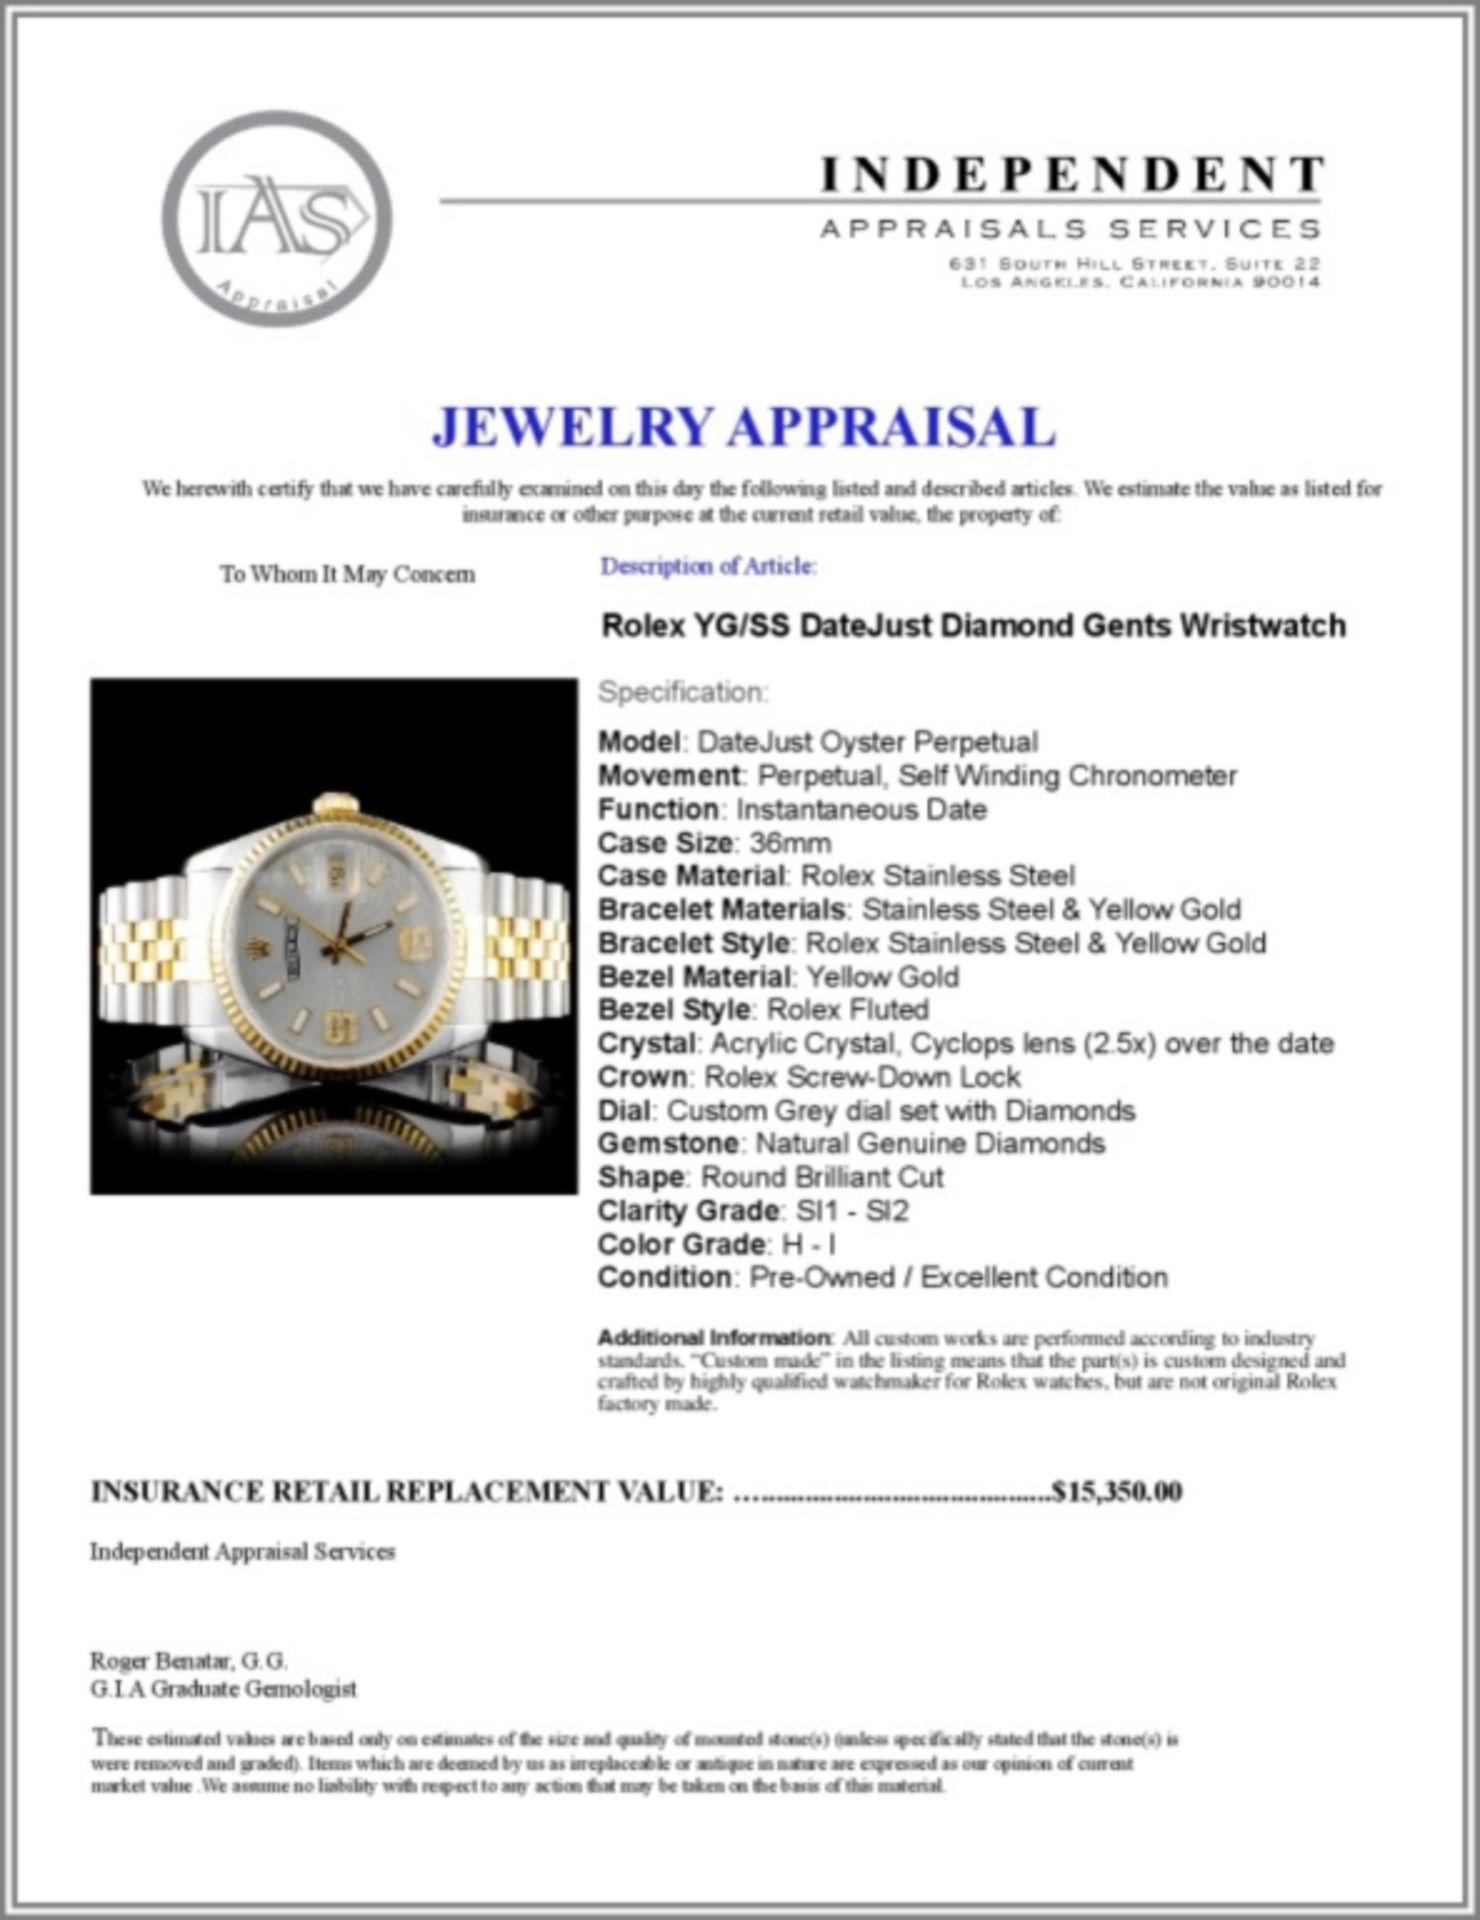 Rolex YG/SS 36MM DateJust Diamond Wristwatch - Image 5 of 5